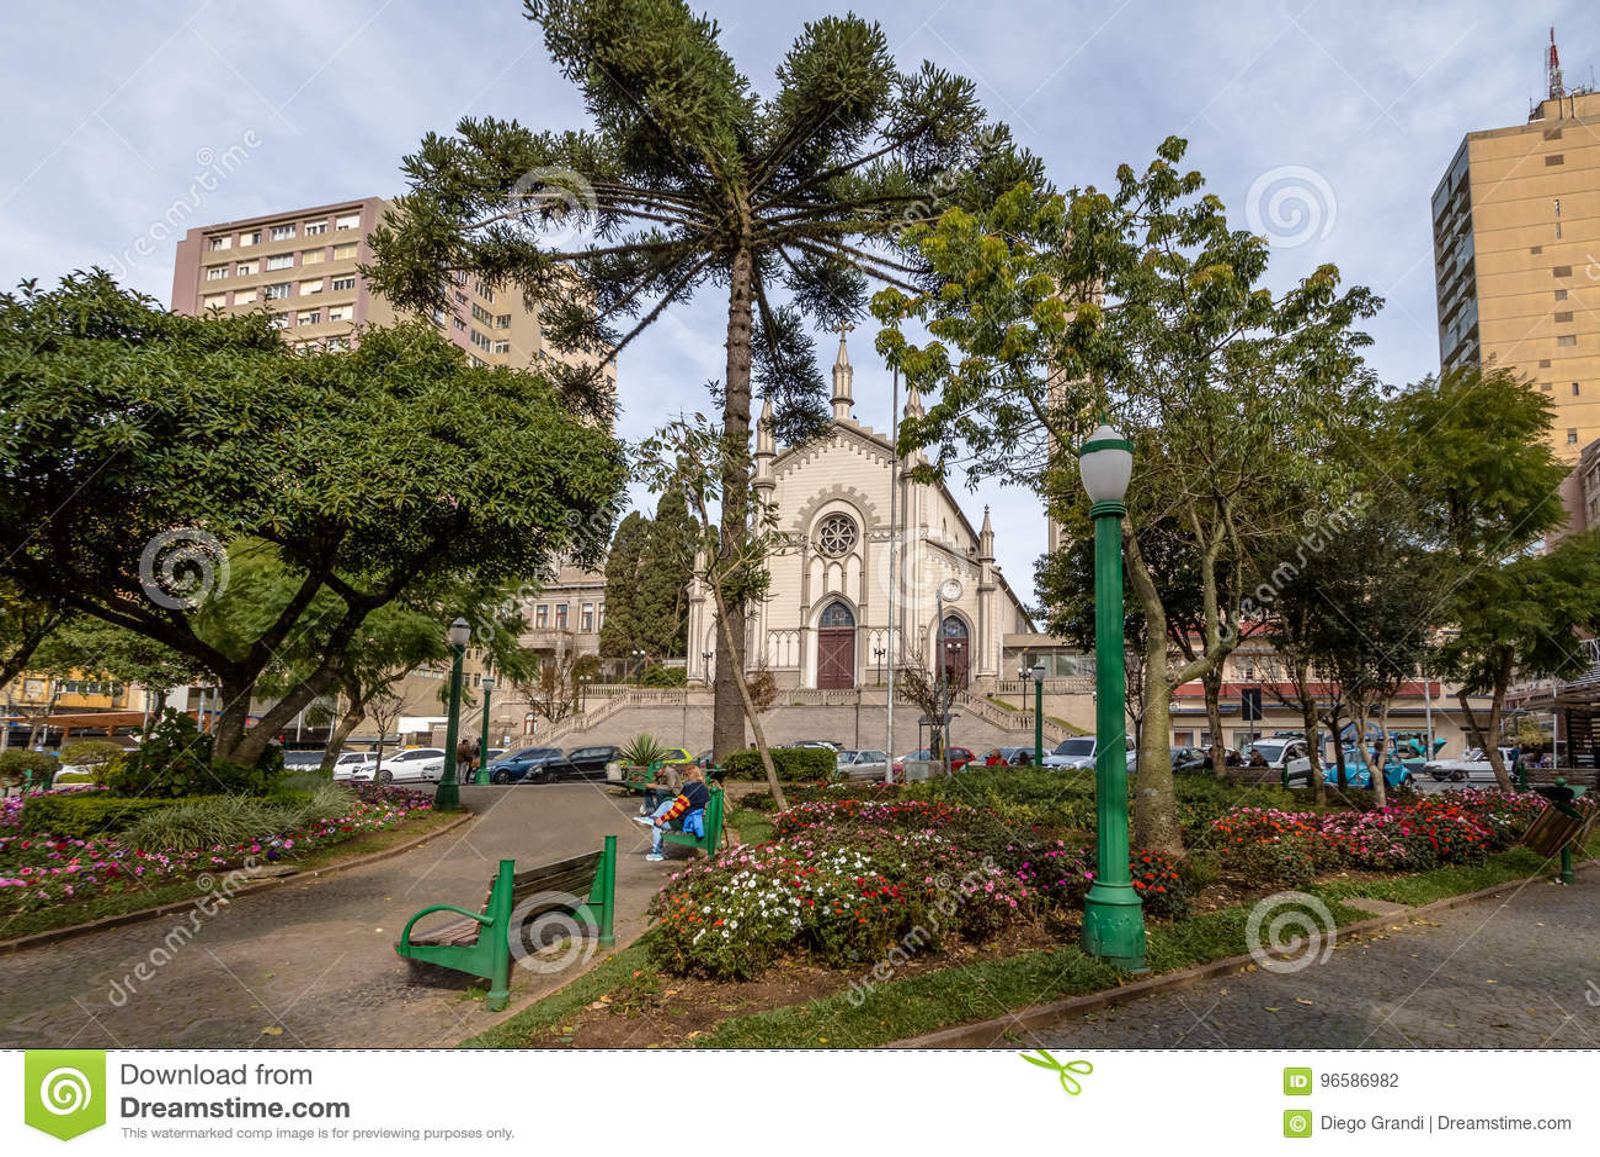 De Kathedraal van Dante Alighieri Square en van Santa Teresa D ` Avila - Caxias do Sul, Rio Grande doet Sul, Brazilië